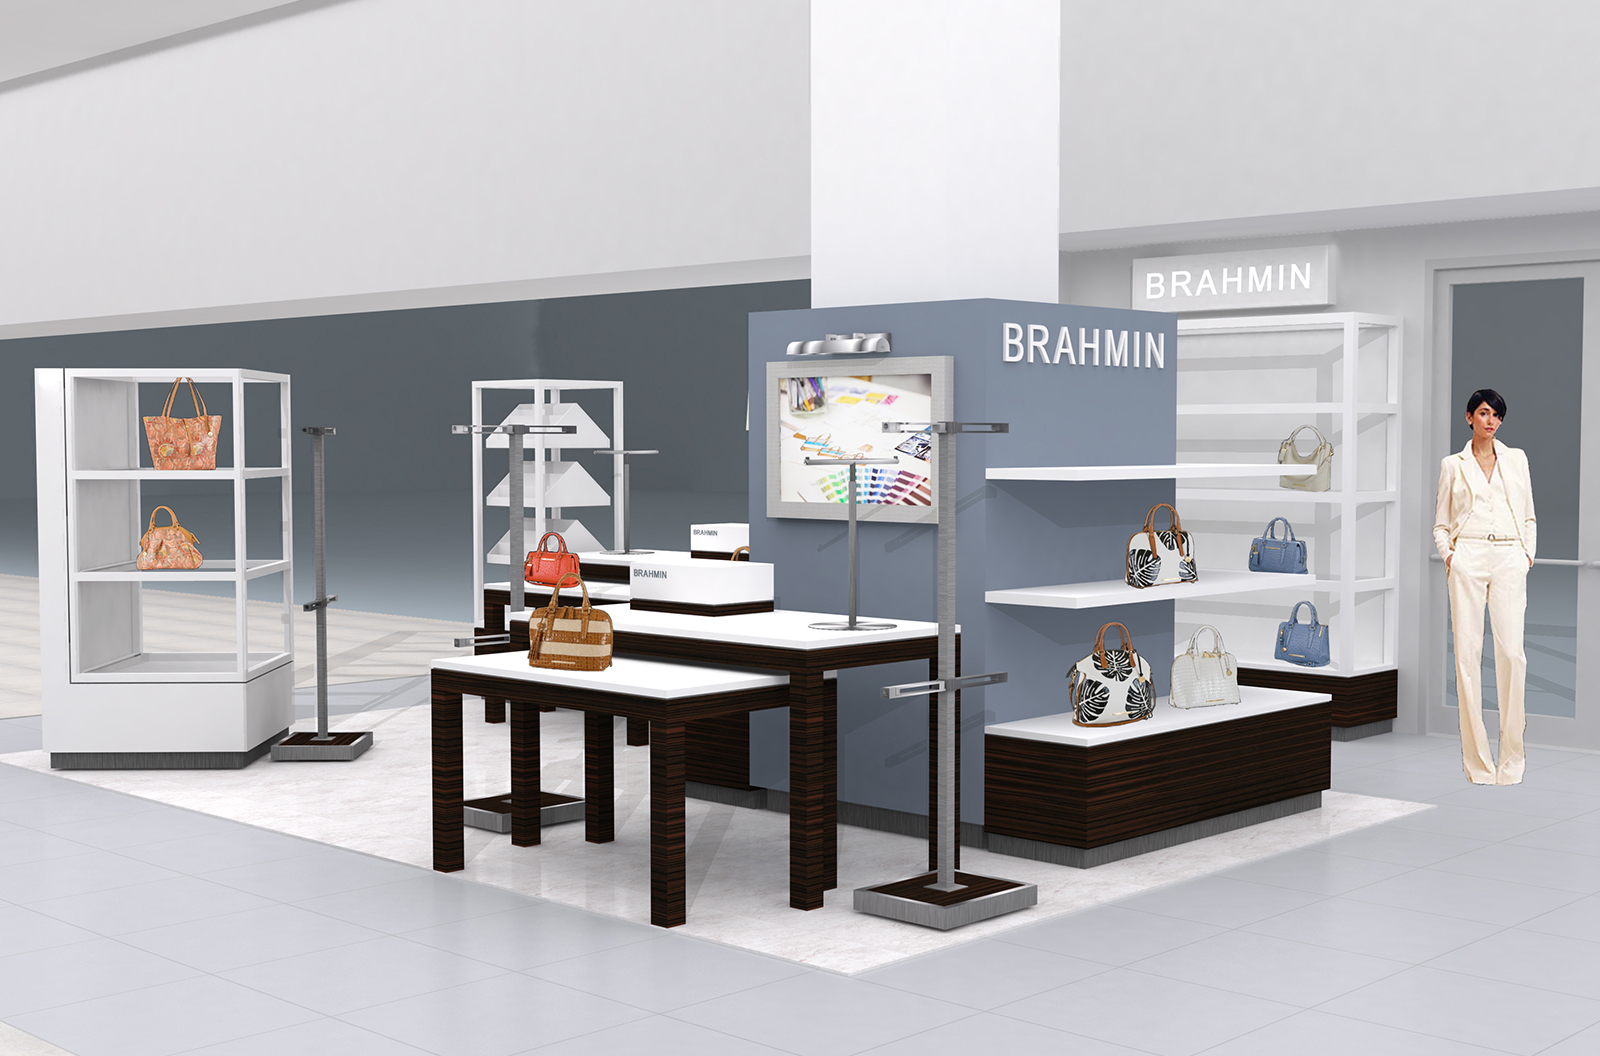 Brahmin Mandarina Studio store commercial design handbags 10.jpg